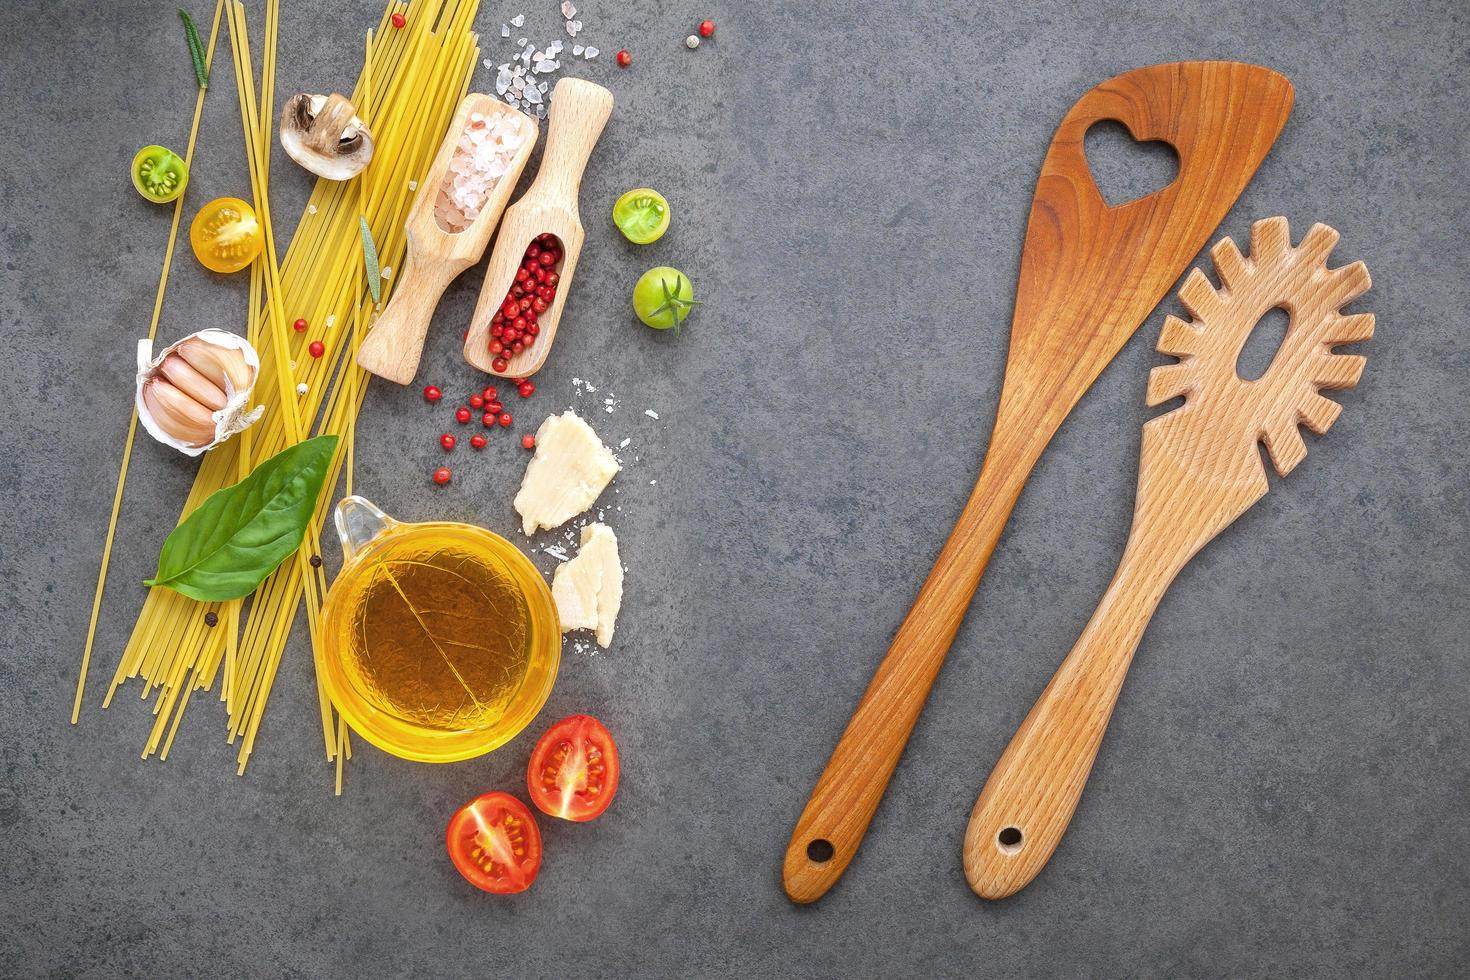 Spaghetti ingredients concept photo